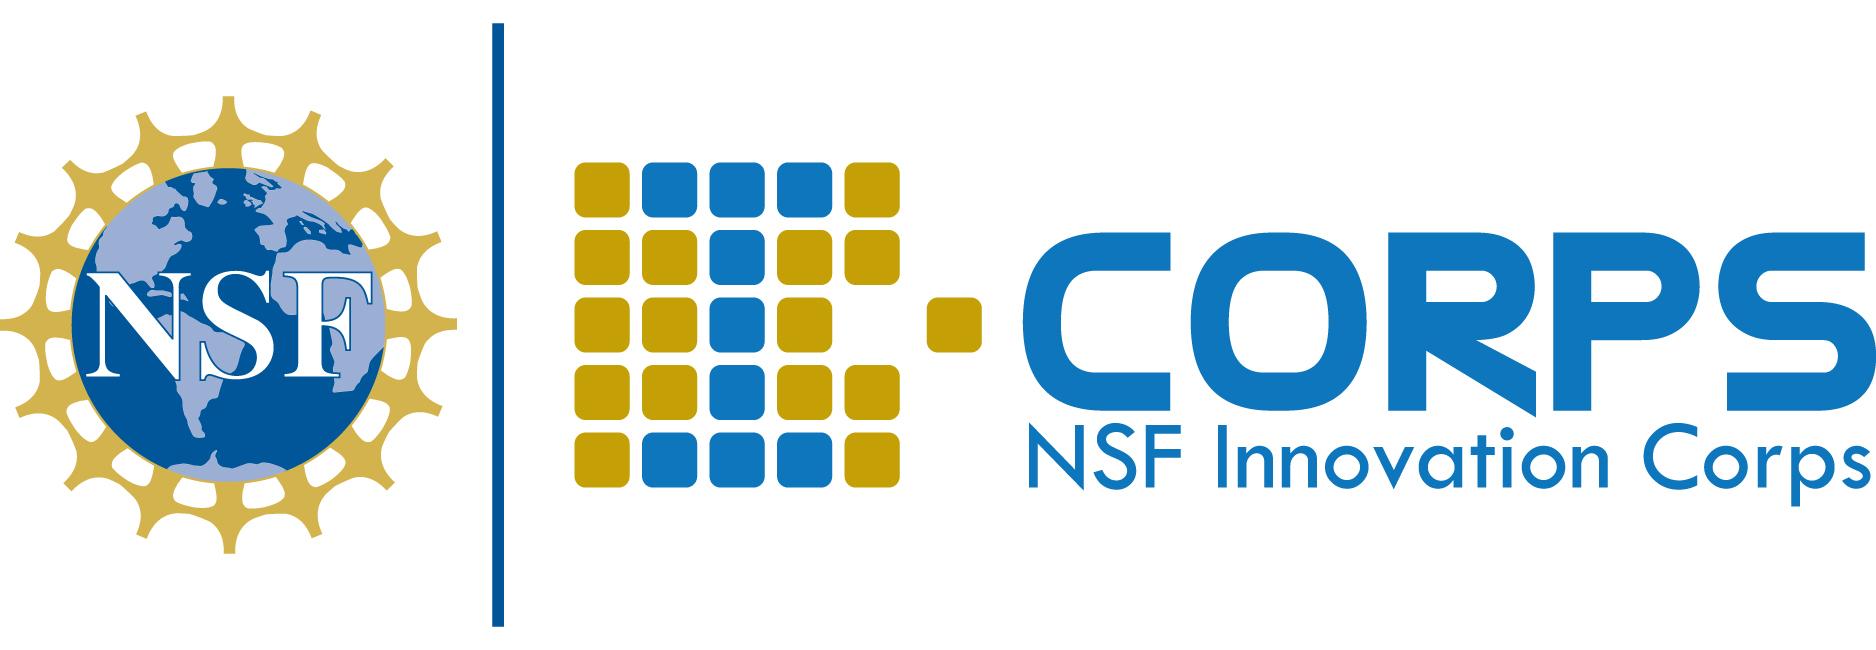 National Science Foundation (NSF) Innovation Corps (I-Corps) logo